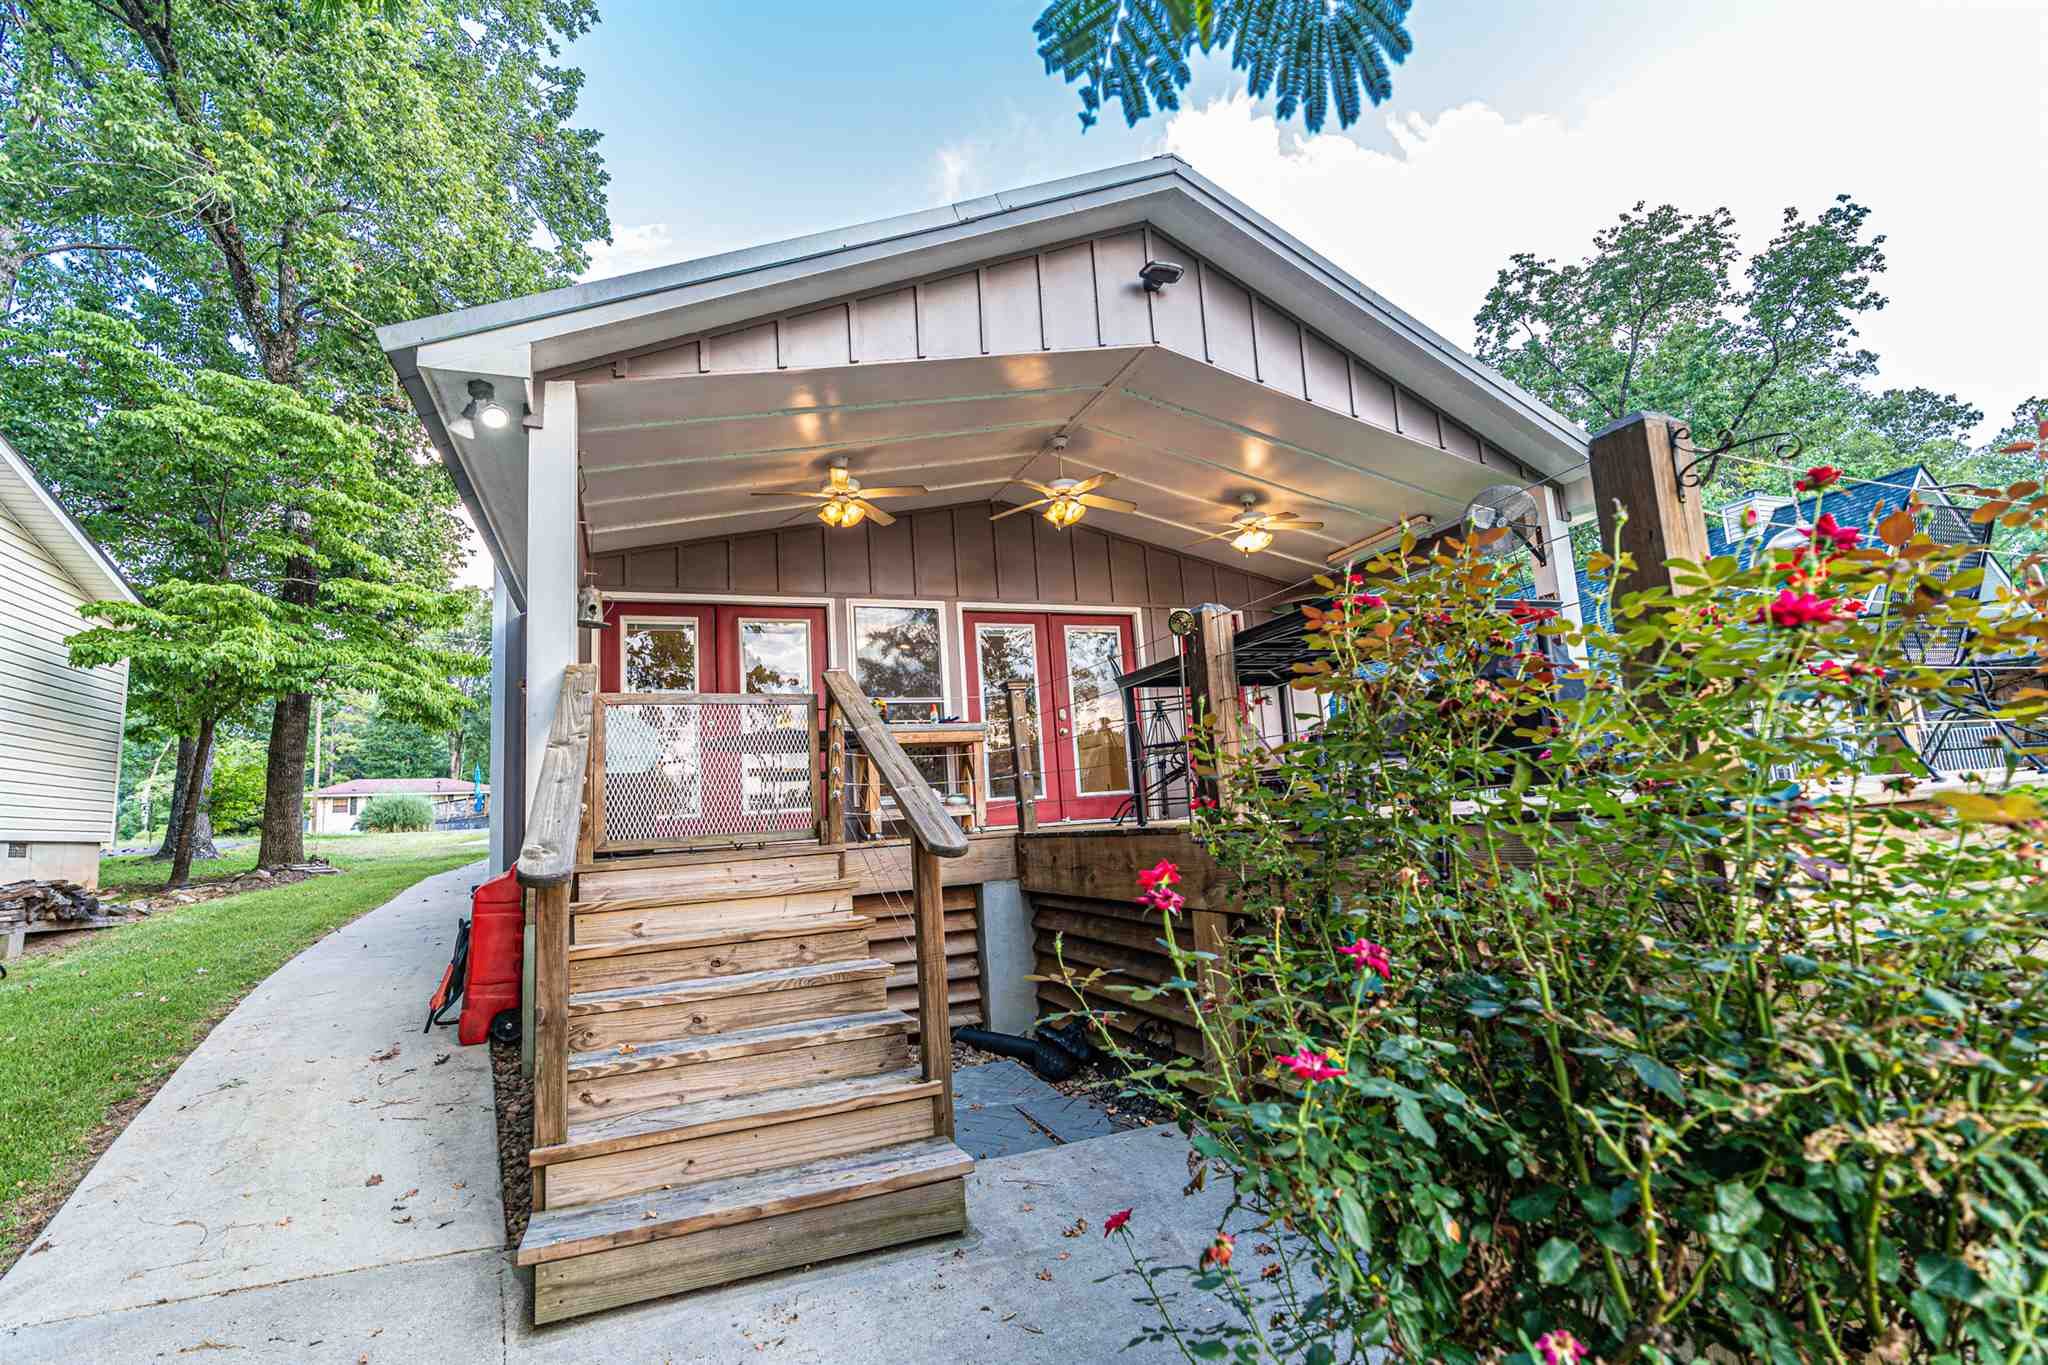 327 SHELTON DRIVE, Lake Oconee in Putnam County, GA 31024 Home for Sale